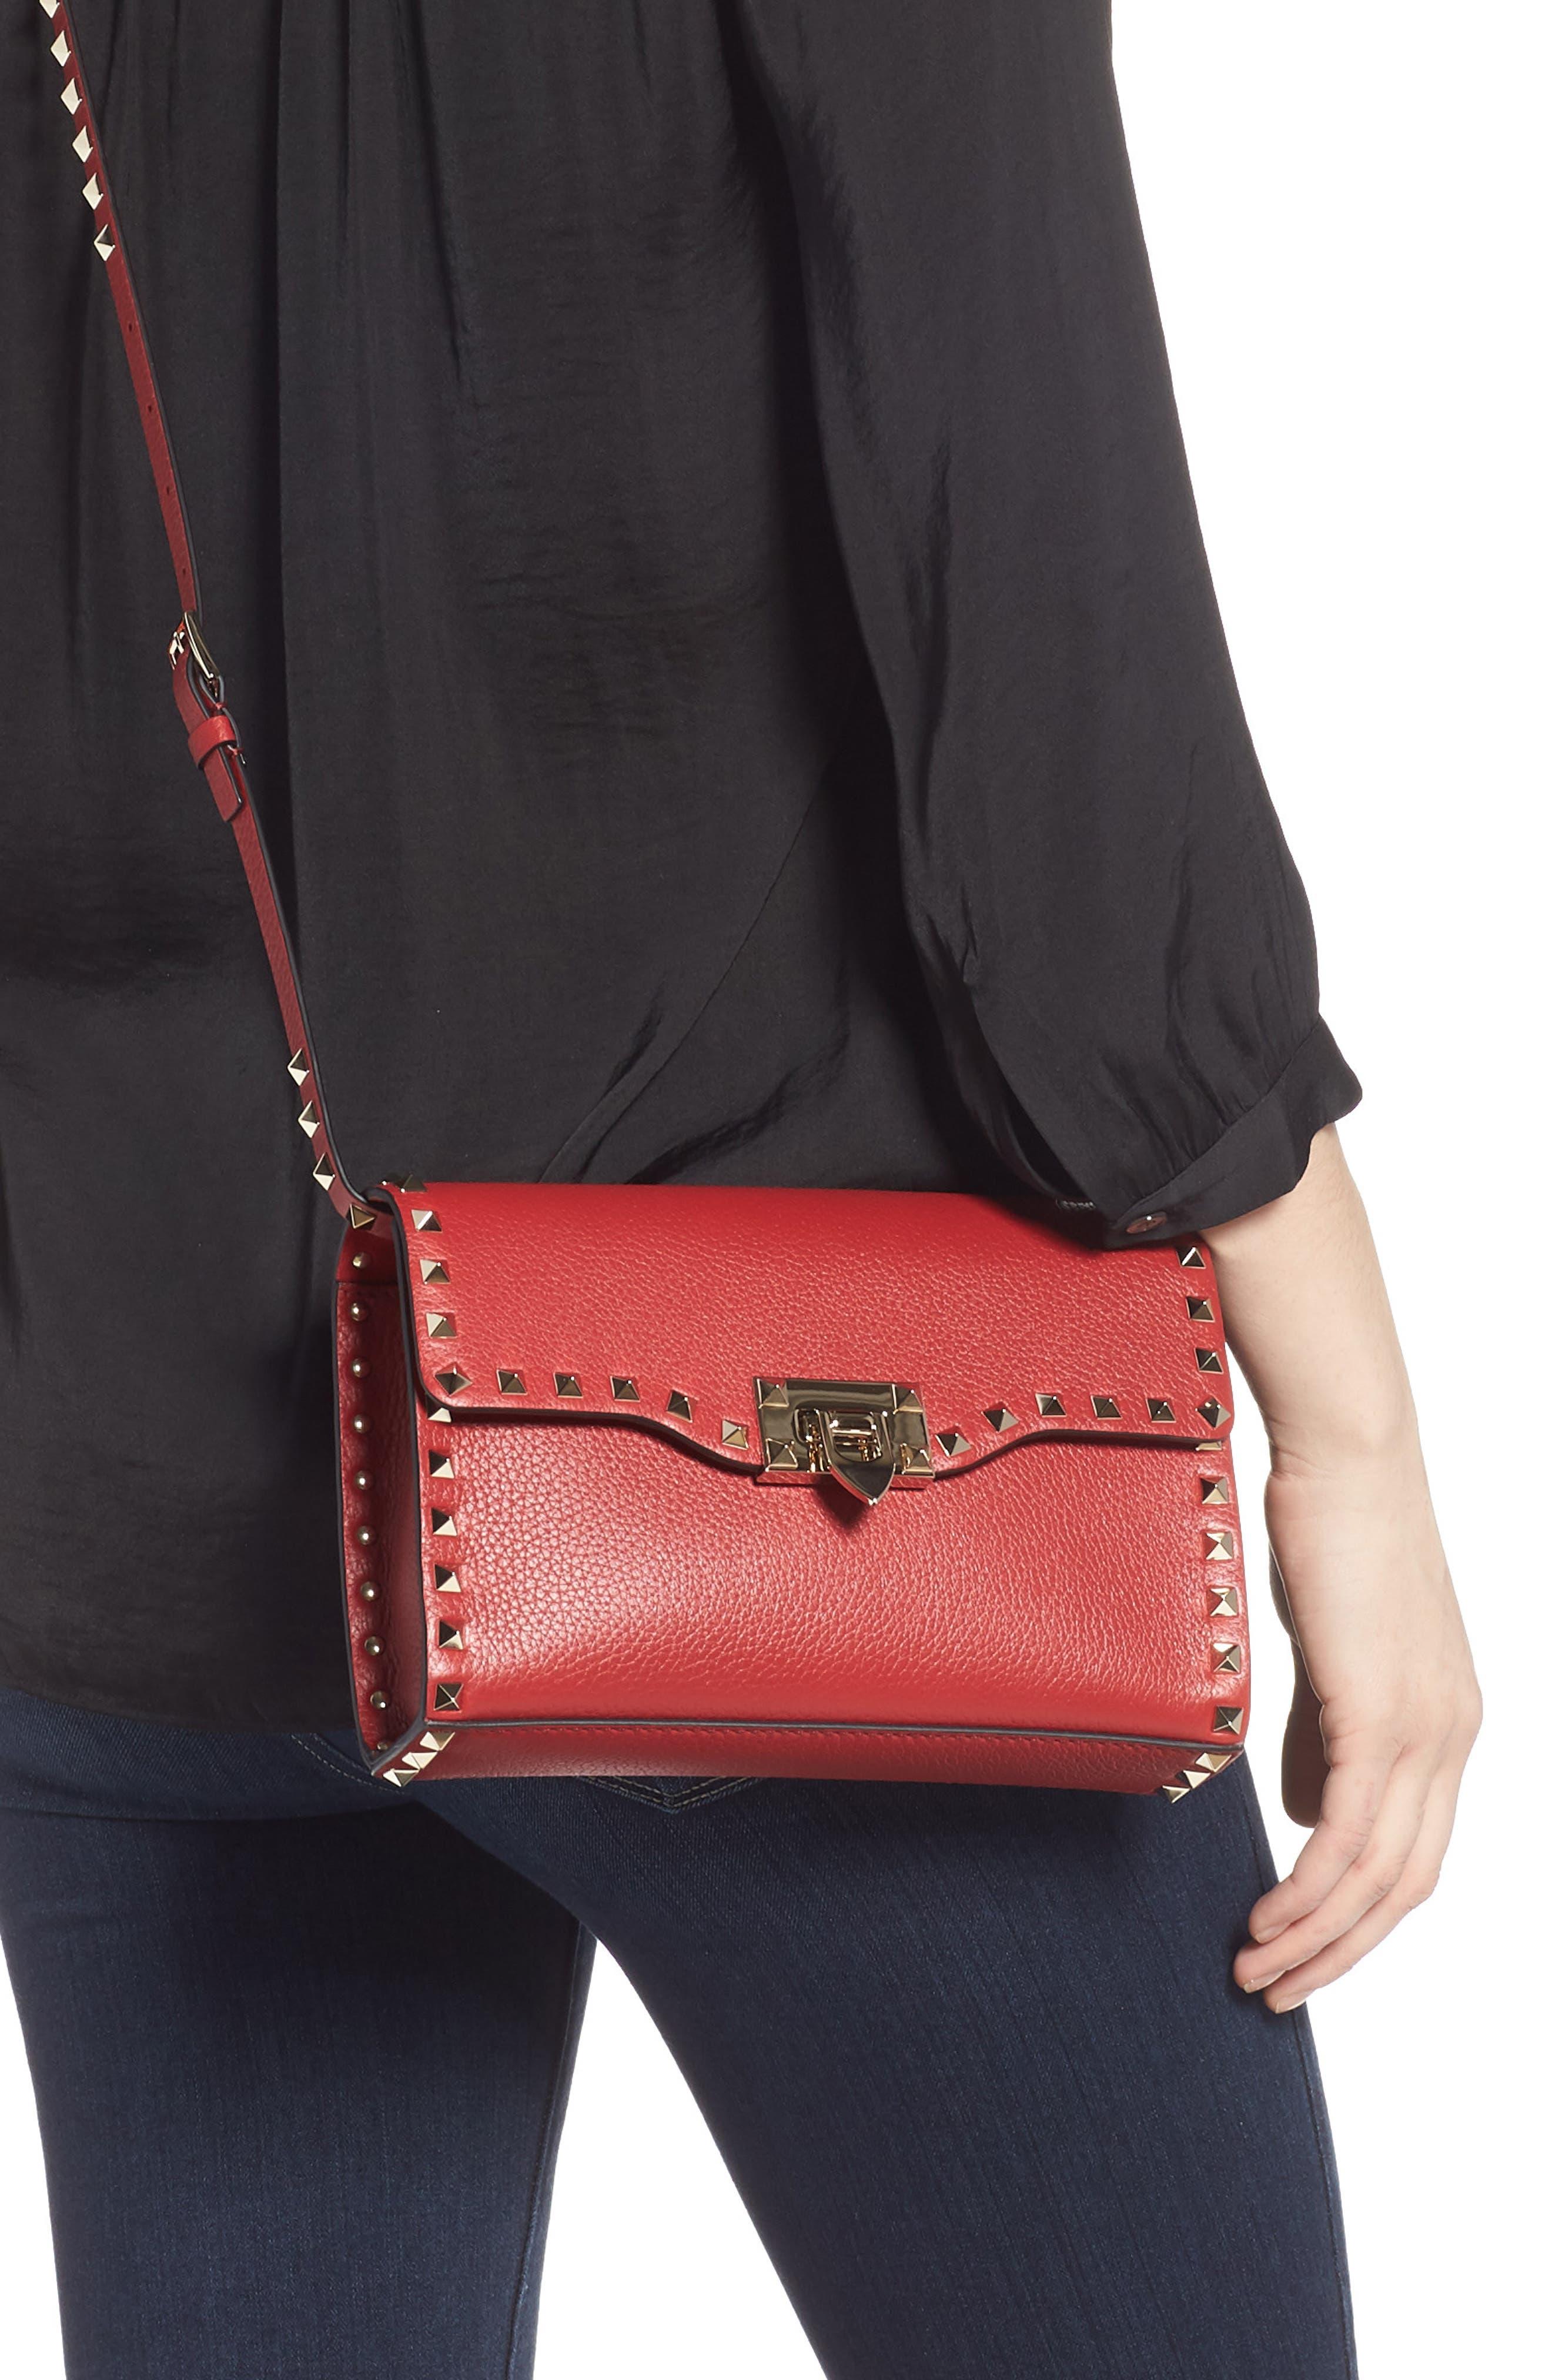 Medium Rockstud Leather Crossbody Bag,                             Alternate thumbnail 2, color,                             ROSSO V